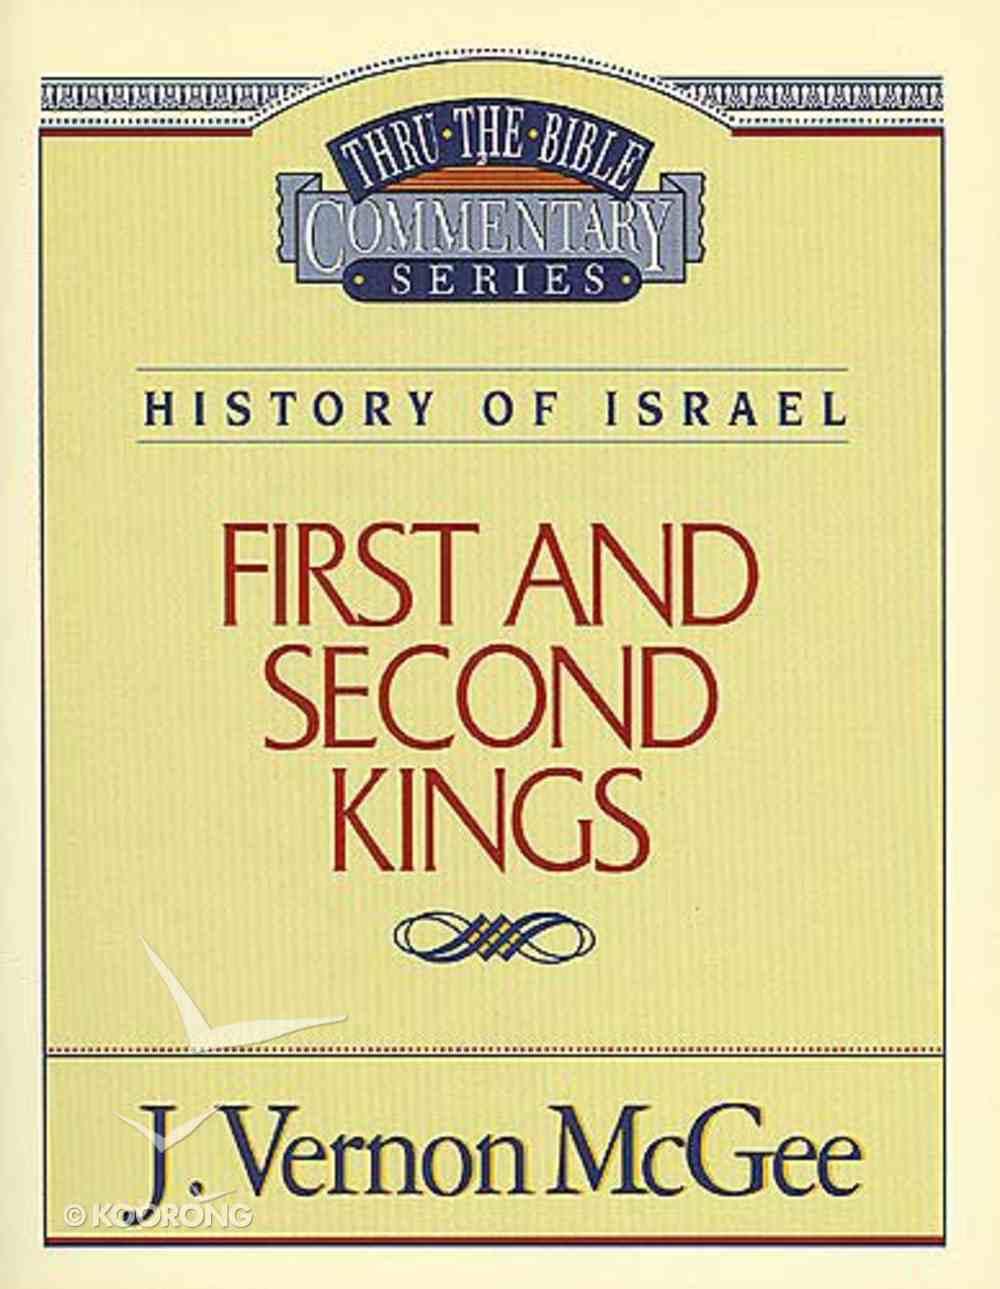 Thru the Bible OT #13: 1 & 2 Kings (#13 in Thru The Bible Old Testament Series) Paperback